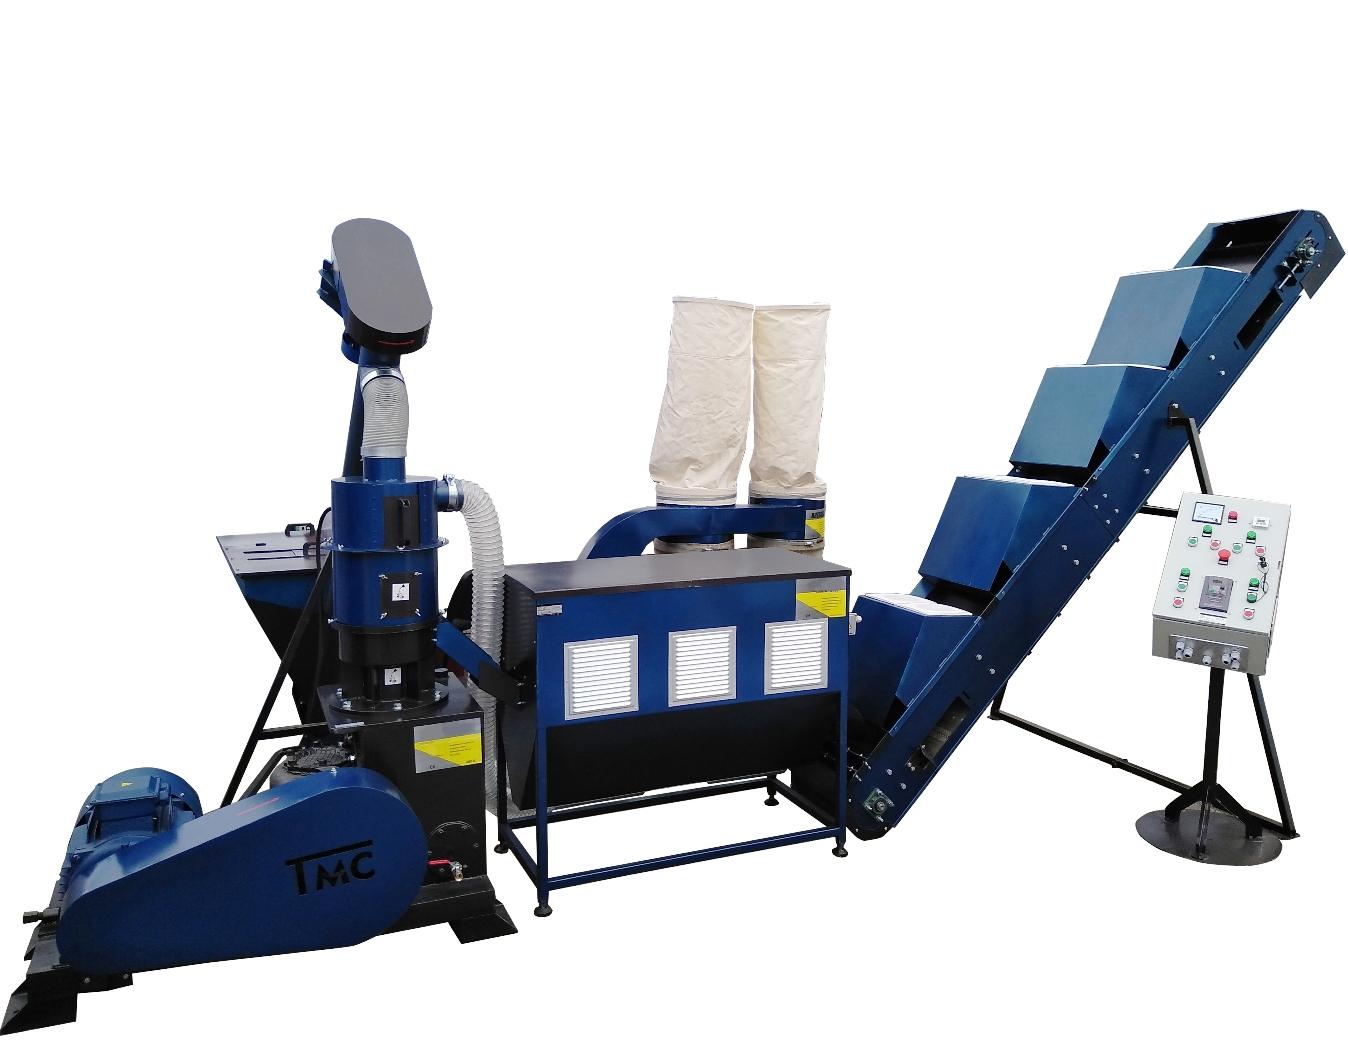 Chwalebne Peleciarka / Linia do produkcji pelletu LDG-3000 - 7368471809 PJ82